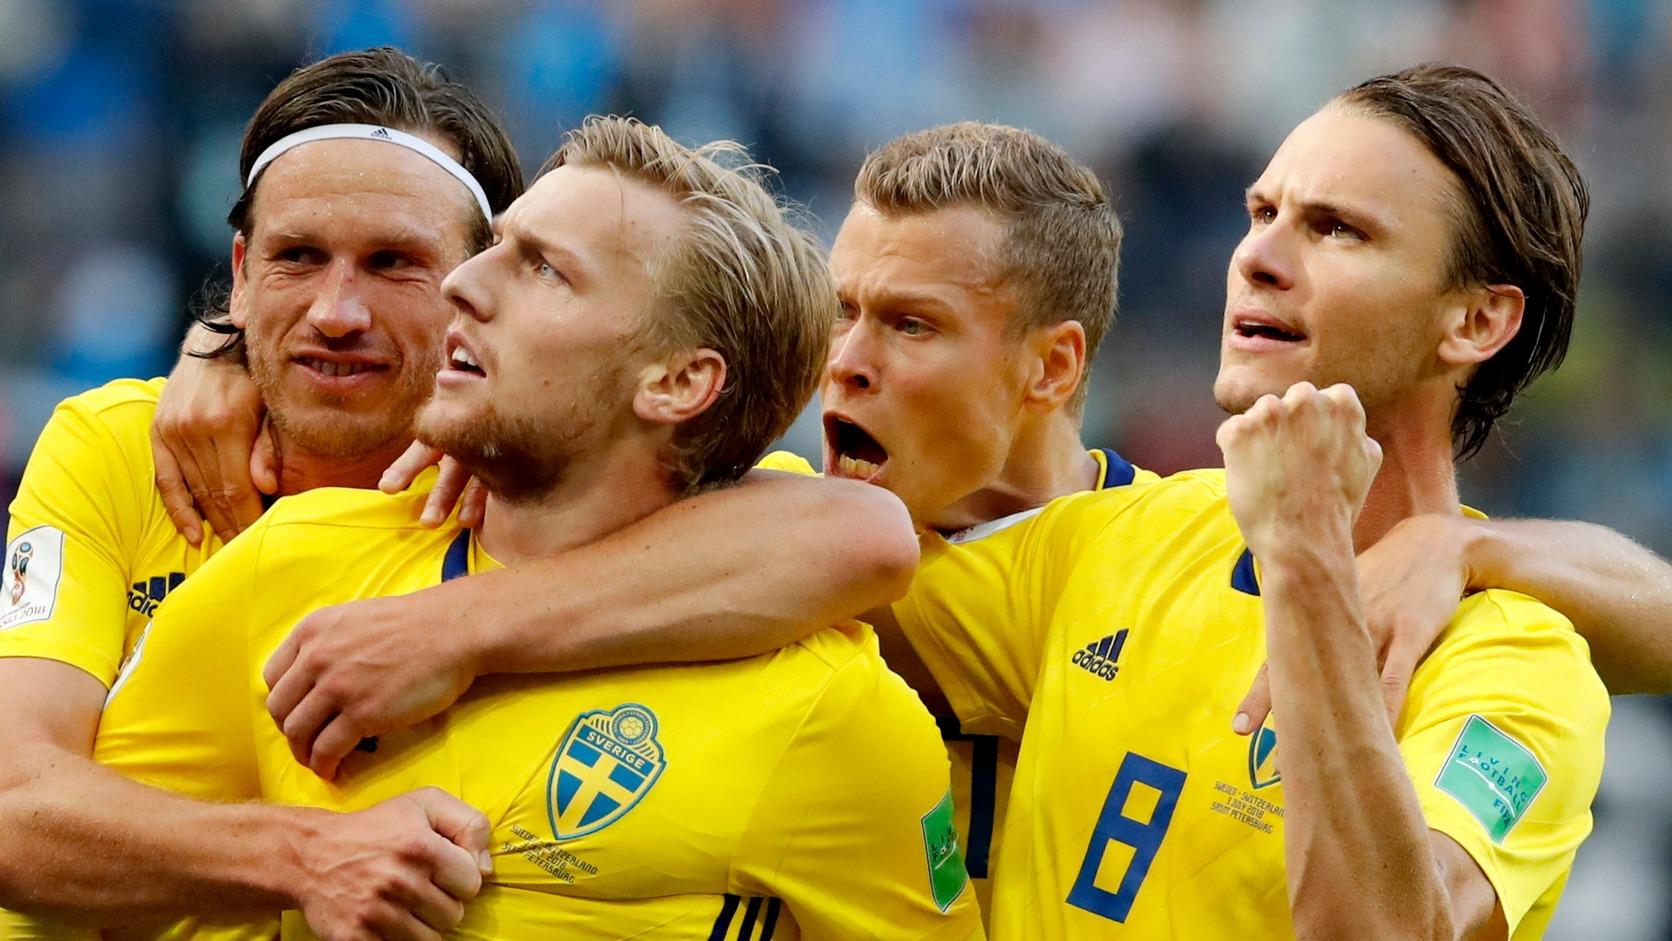 Svéd gólöröm a Svájc elleni vb-nyolcaddöntőben (Fotó: EPA/Anatolij Malcev)